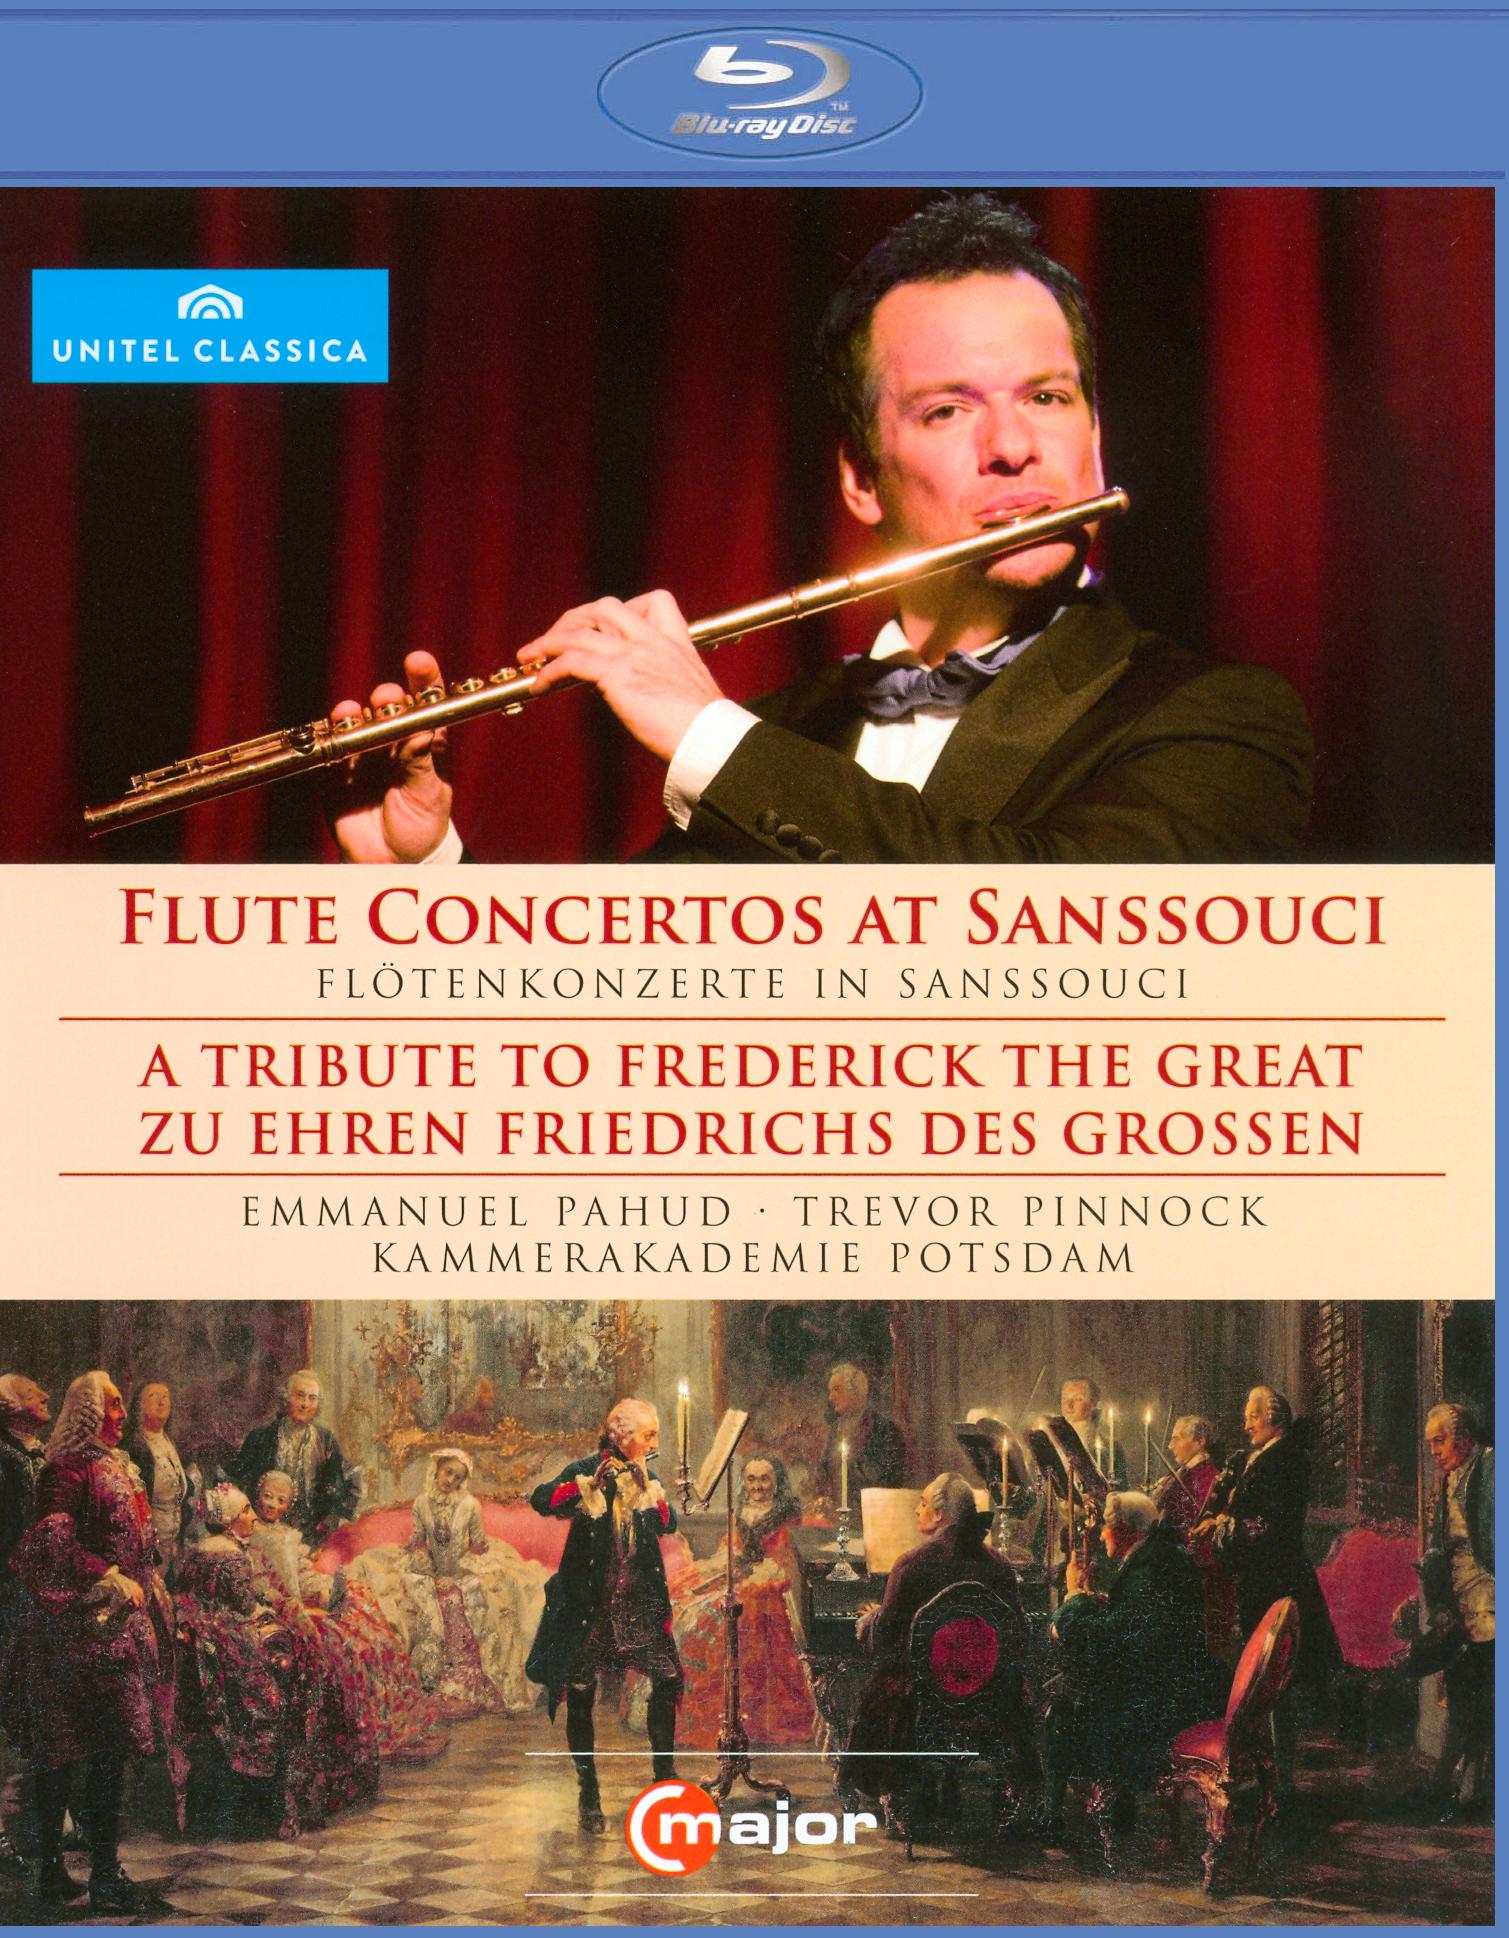 Emmanuel Pahud/Trevor Pinnock/Kammerakademie Potsdam: Flute Concertos at Sanssouci